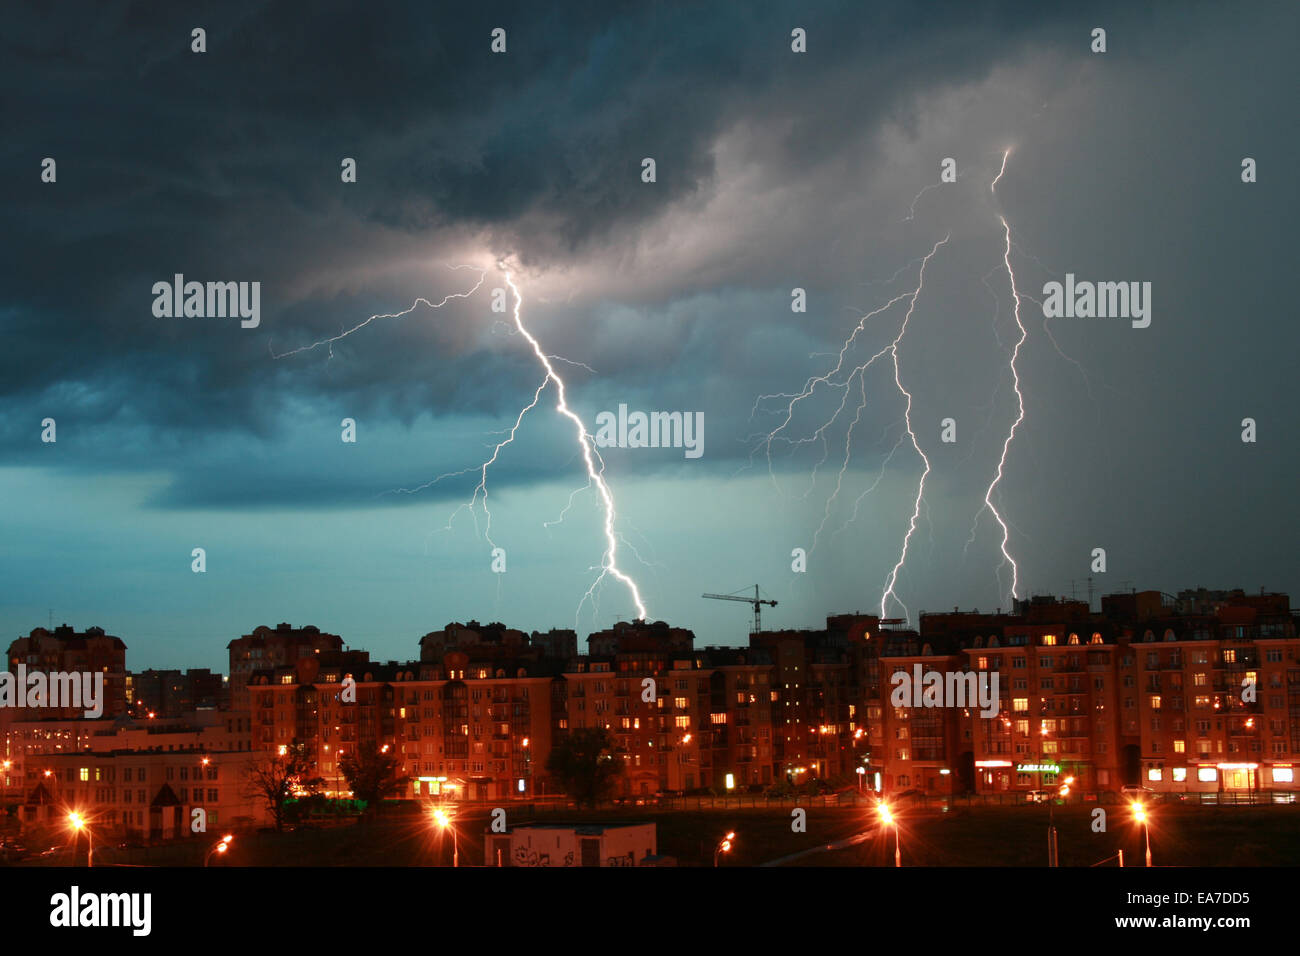 Lightning over night city during a lightning storm Stock Photo